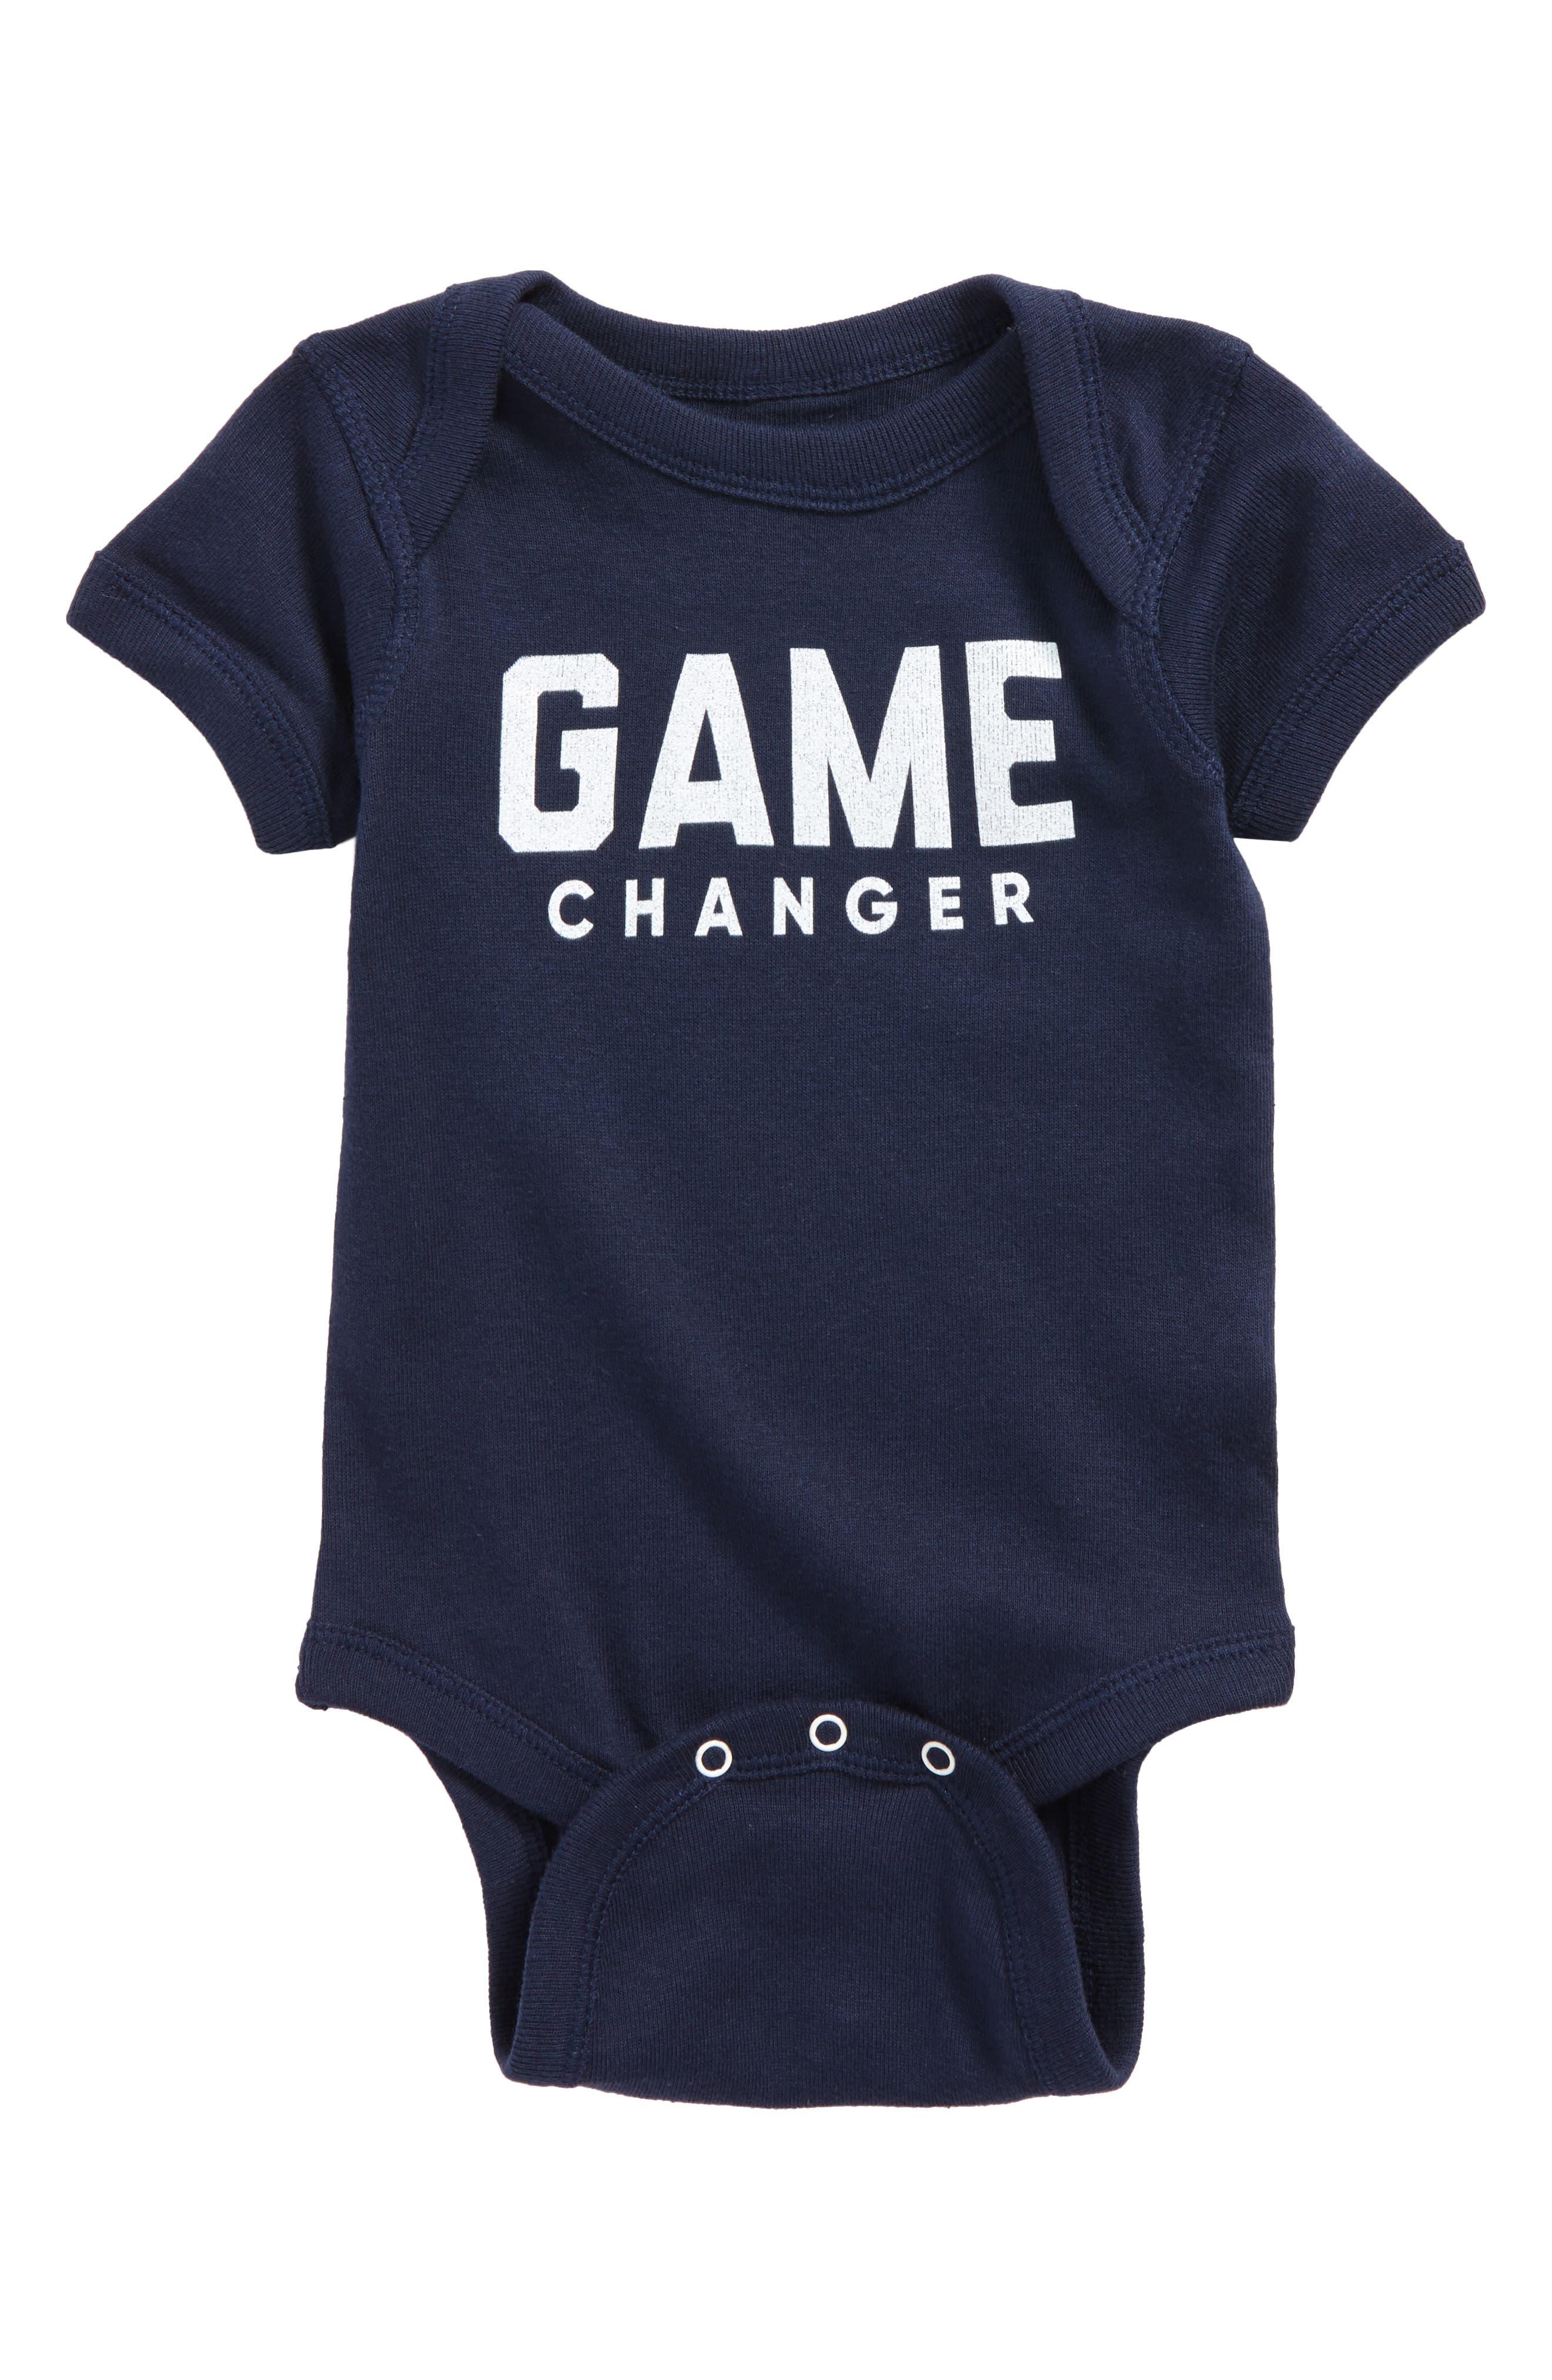 Main Image - Kid Dangerous Game Changer Bodysuit (Baby Boys)